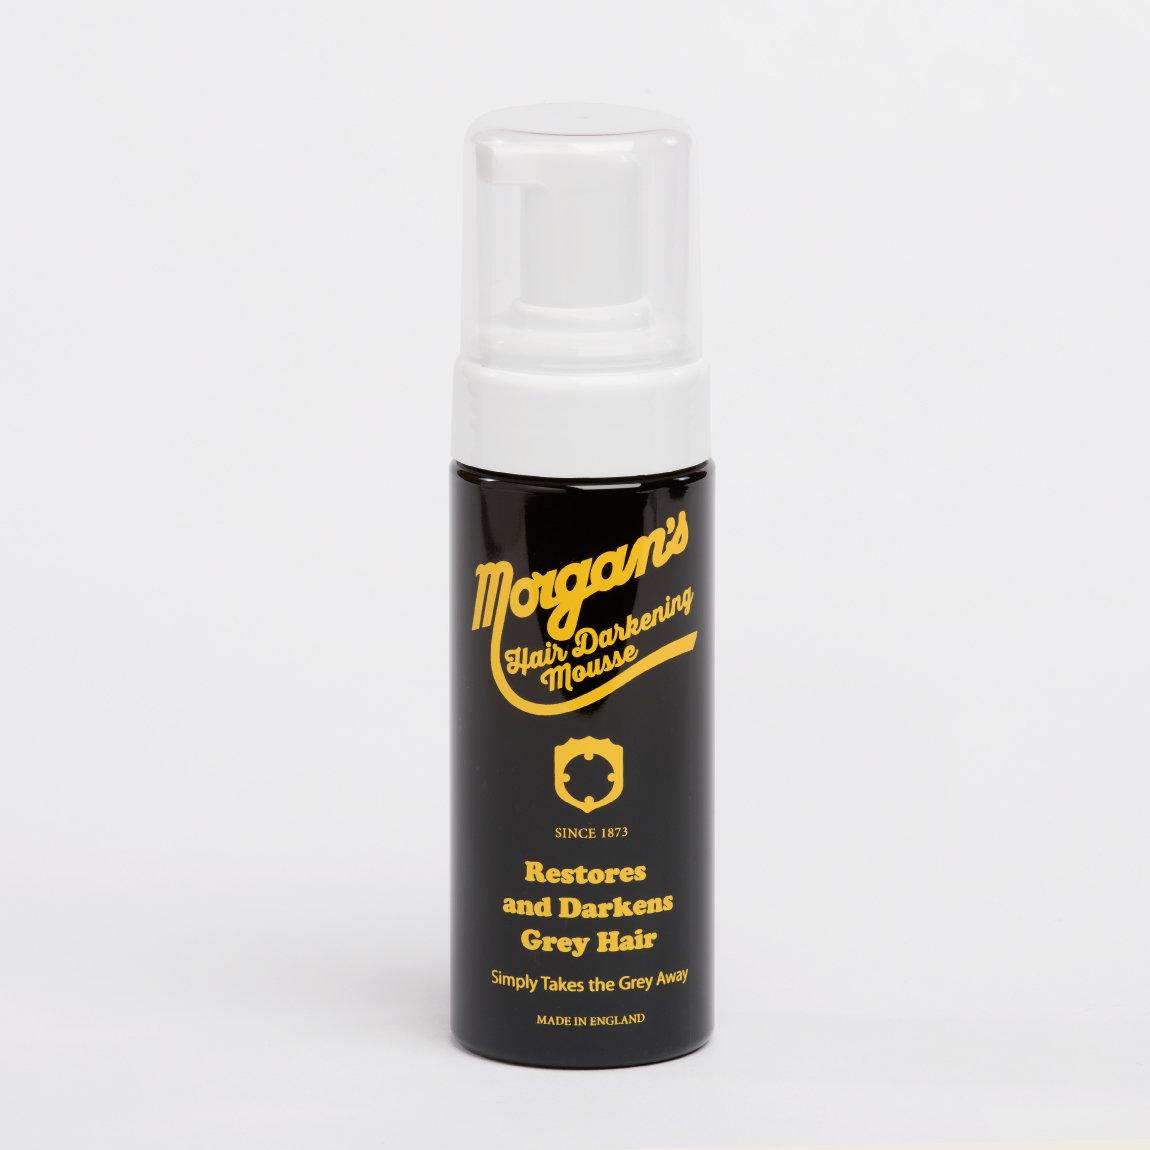 MORGAN'S Hair Darkening Mousse - Мусс для укладки волос маскирующий седину 150 мл